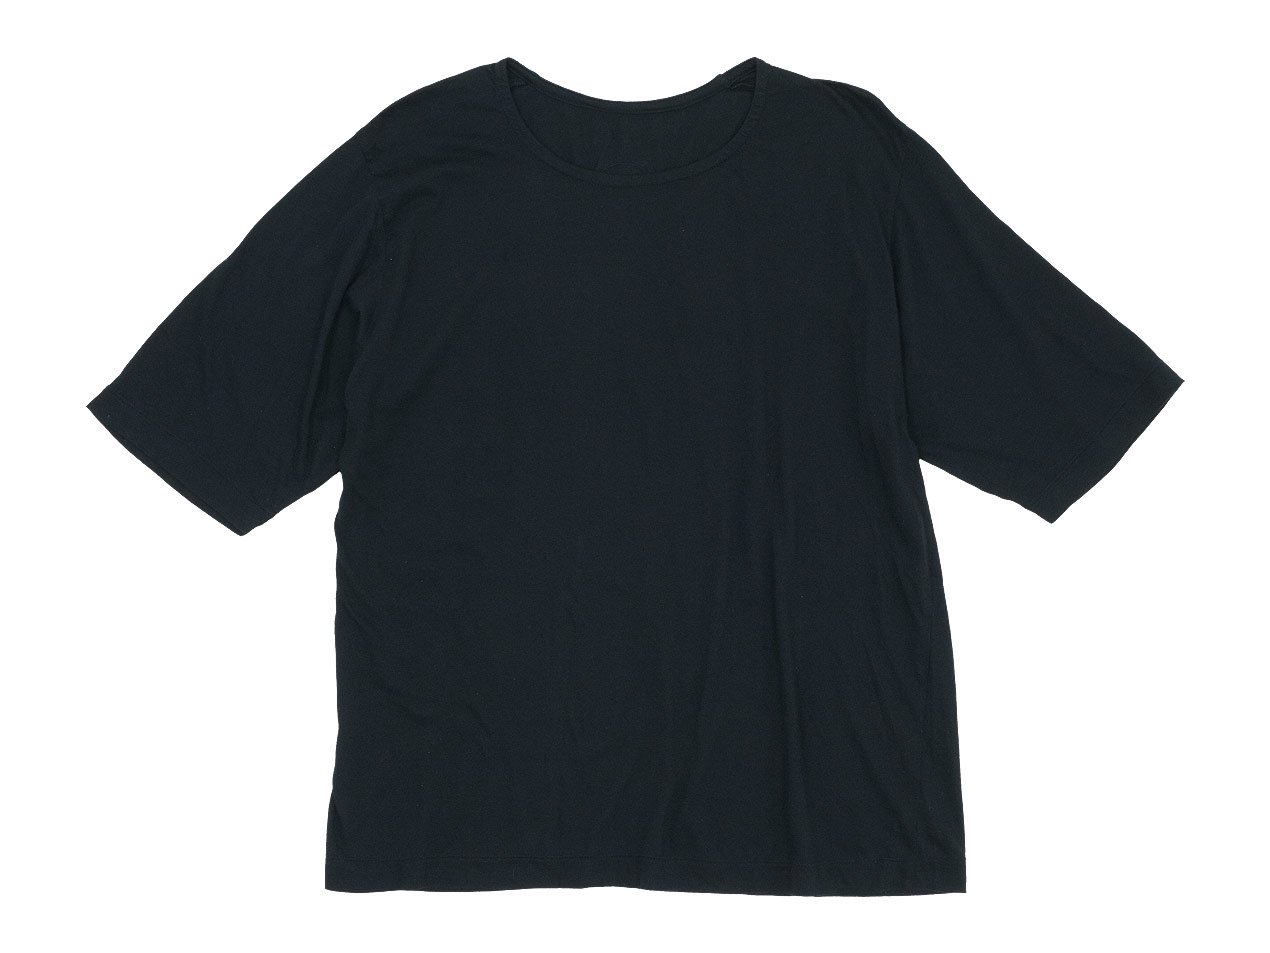 Atelier d'antan Neruda(ネルダ) Shirt BLACK